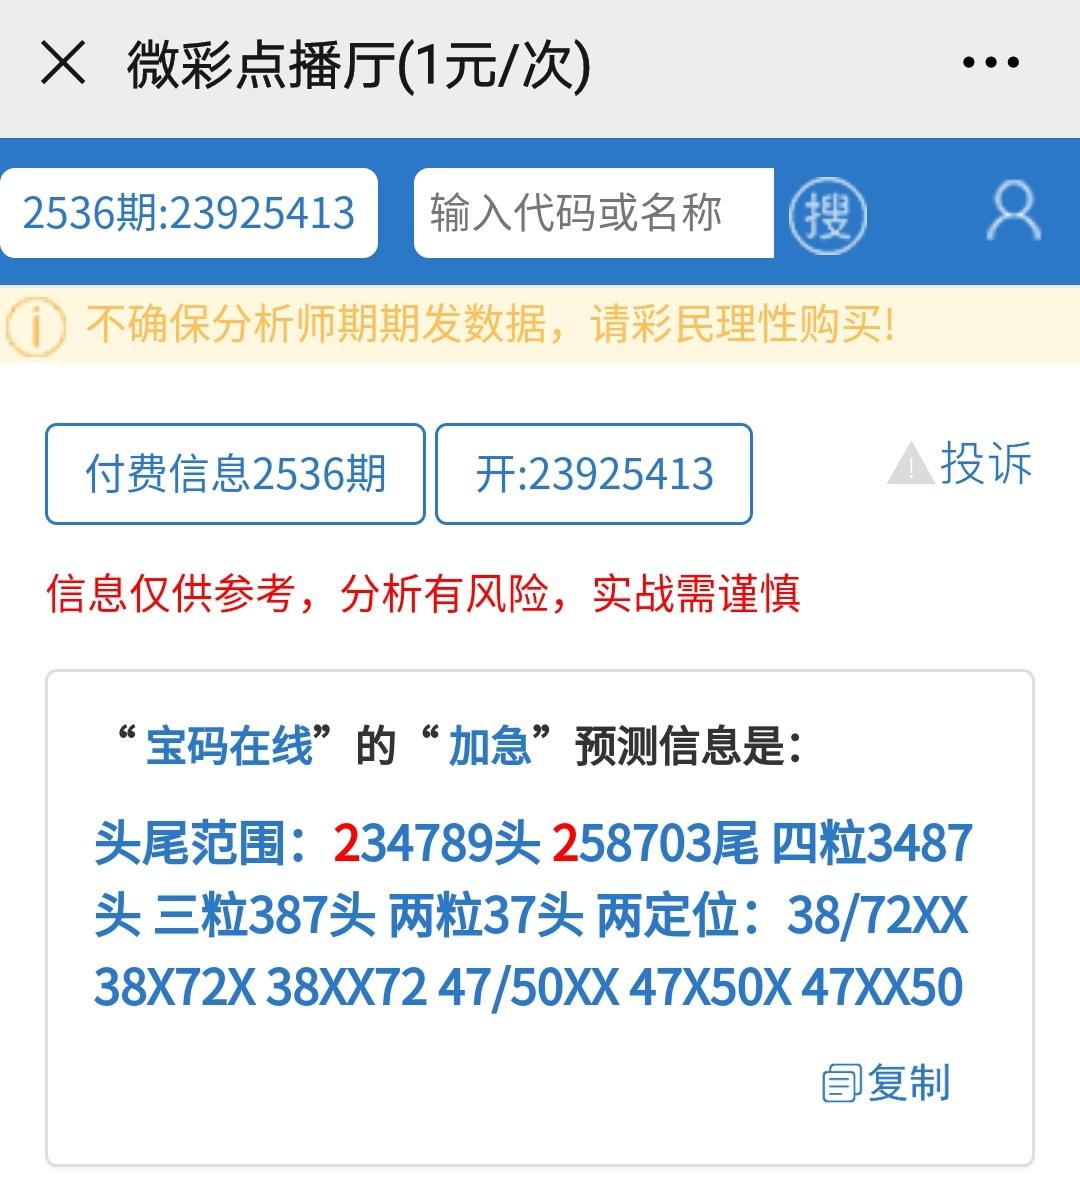 IMG_20210112_211445.jpg